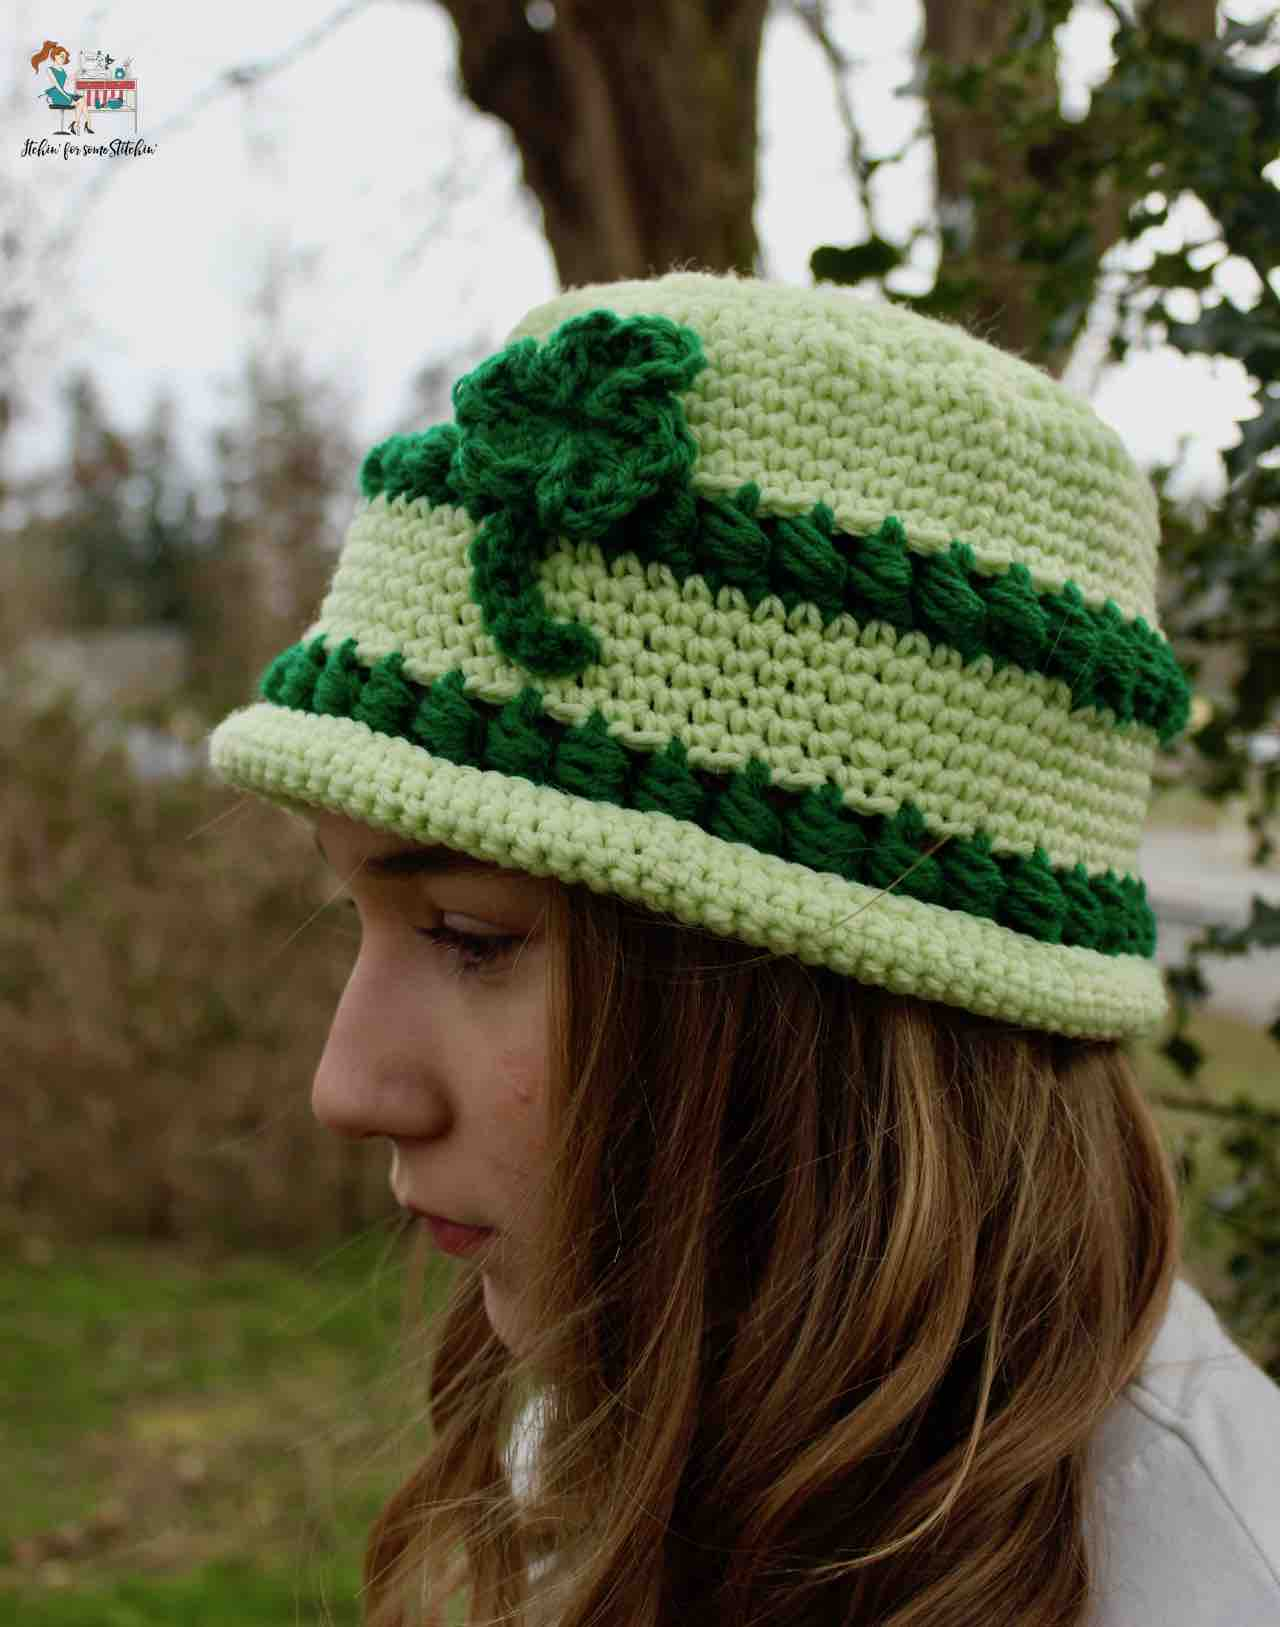 St. Patrick's Day Bowler Hat pattern by www.itchinforsomestitchin.com